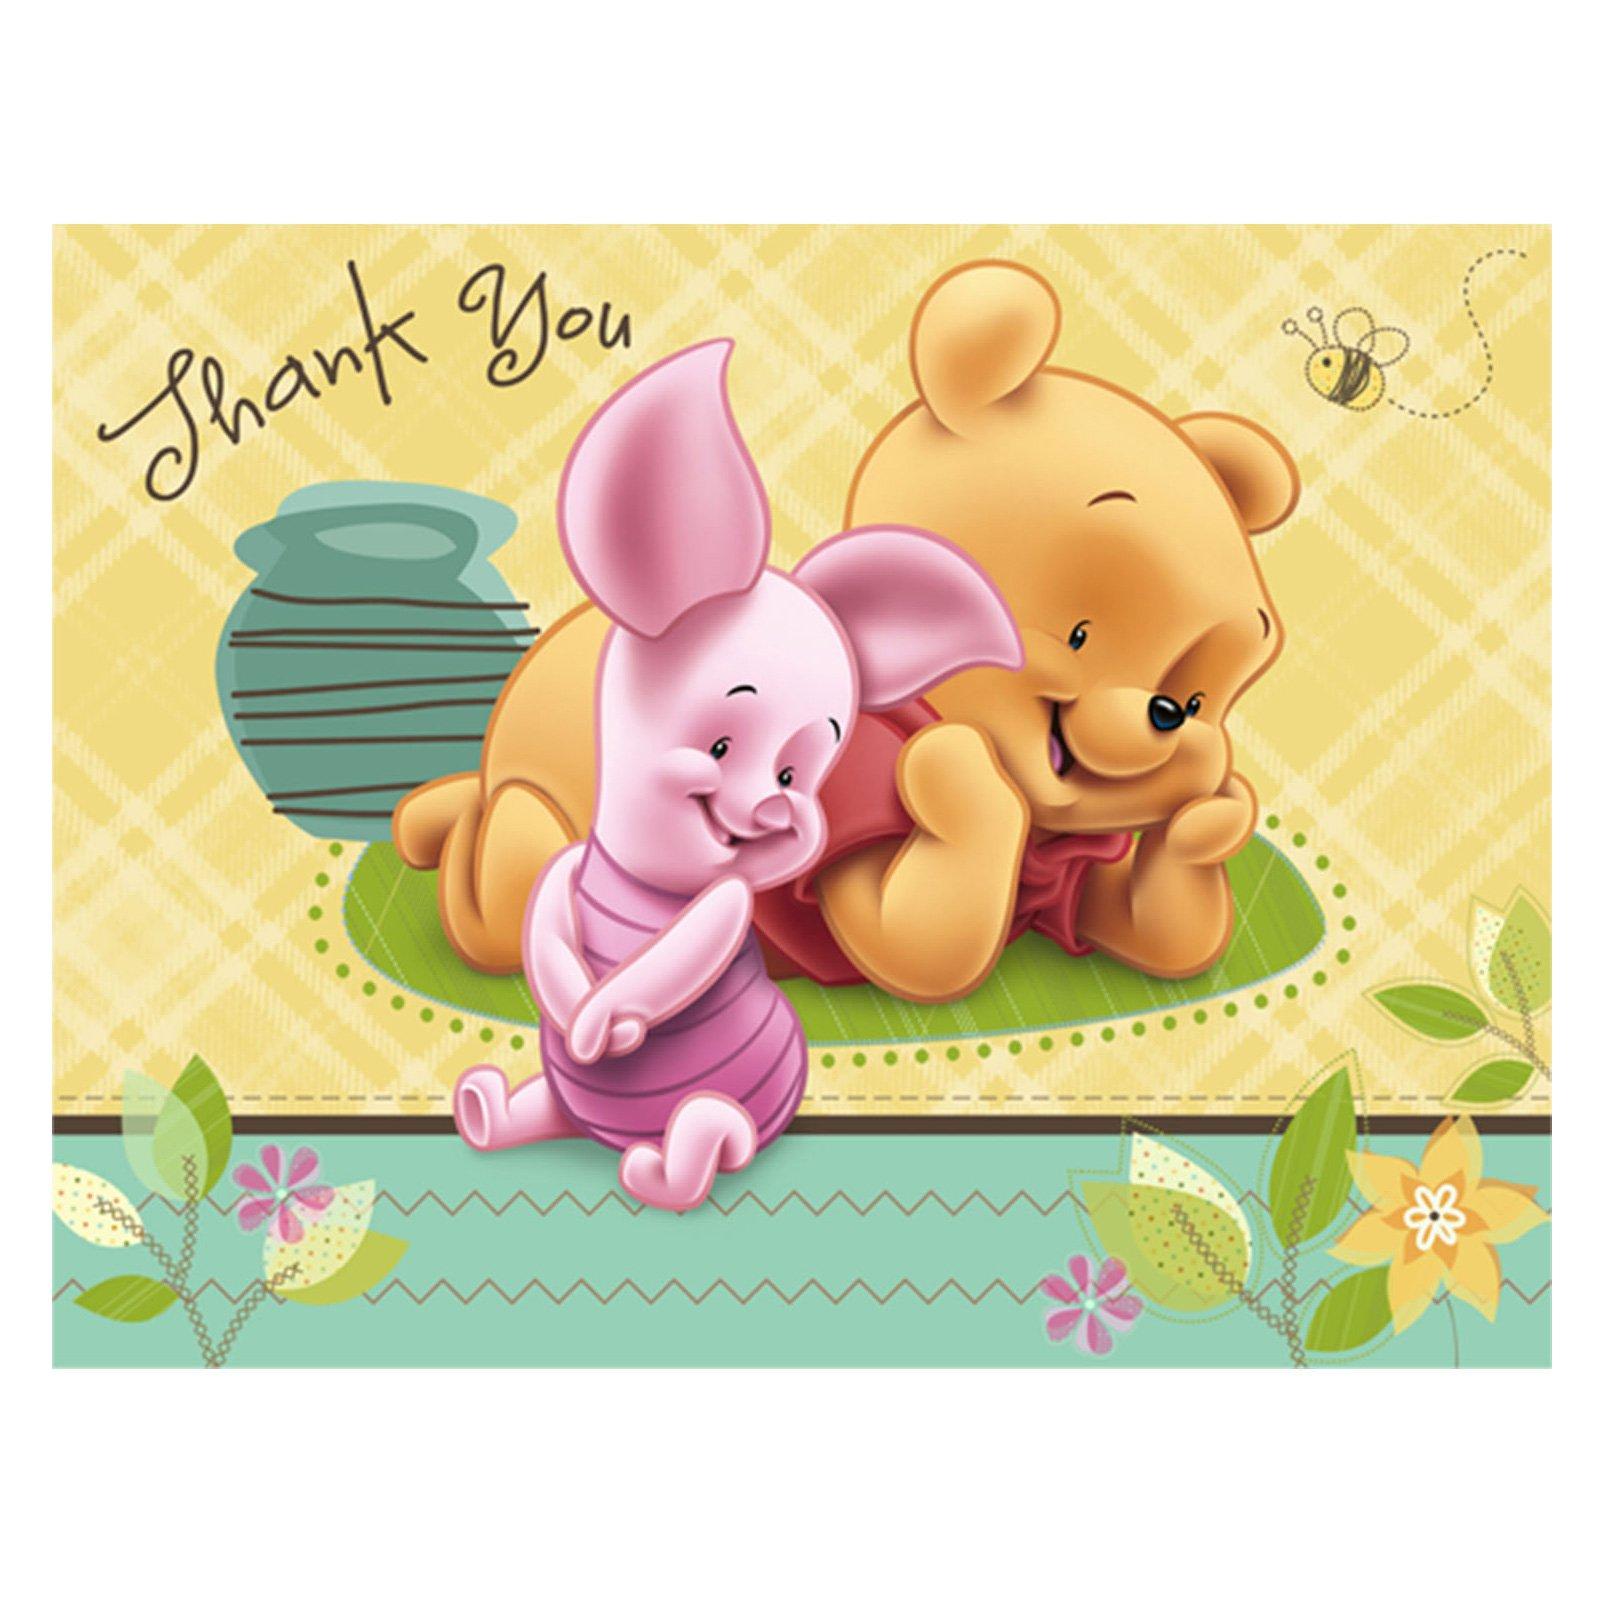 Wallpaper Winnie The Pooh: Baby Winnie The Pooh Wallpaper